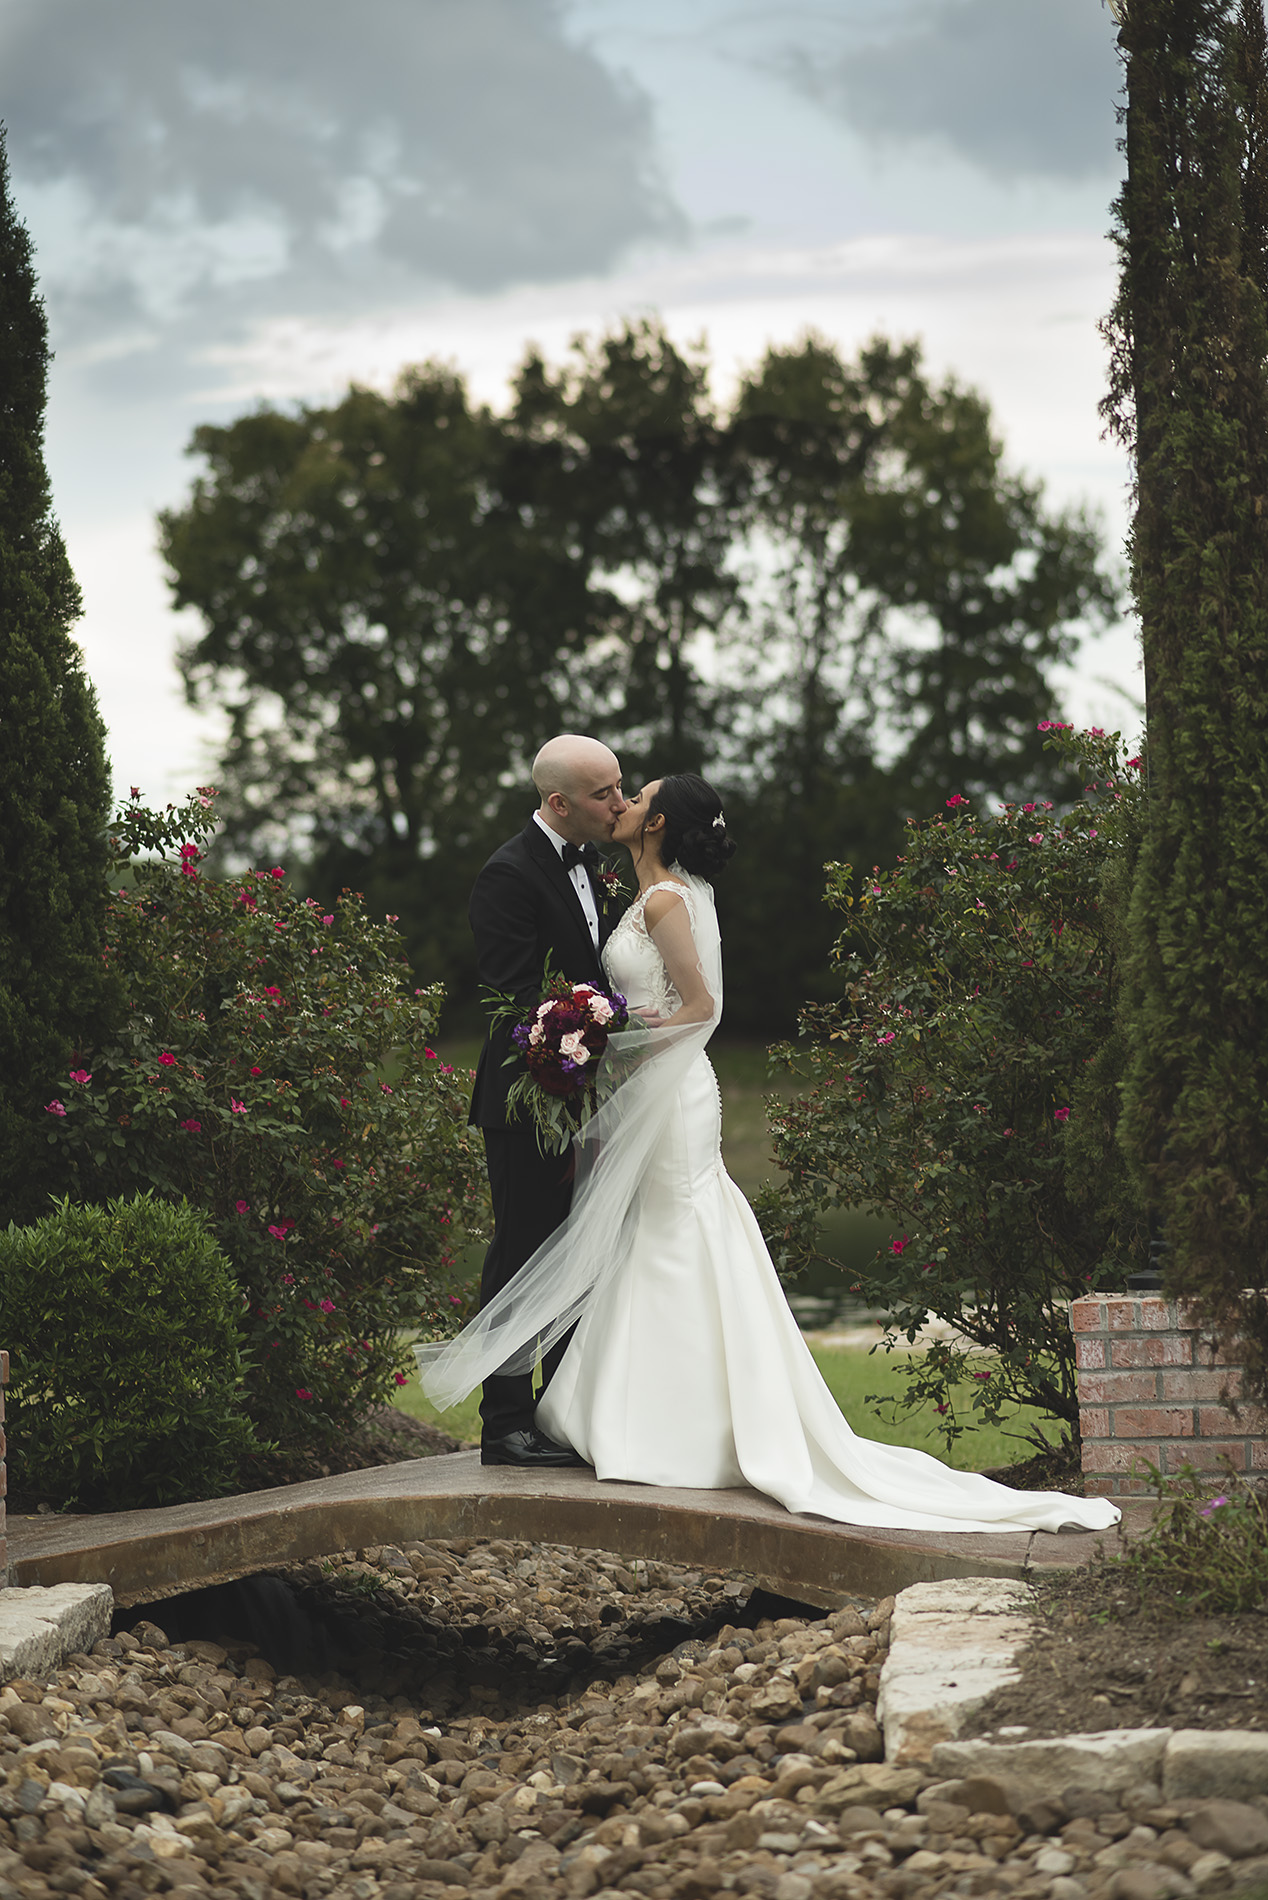 Houston-venue-Olde-Dobbin-Station-Romantic-Classic-Wedding-Photographer-090.jpg